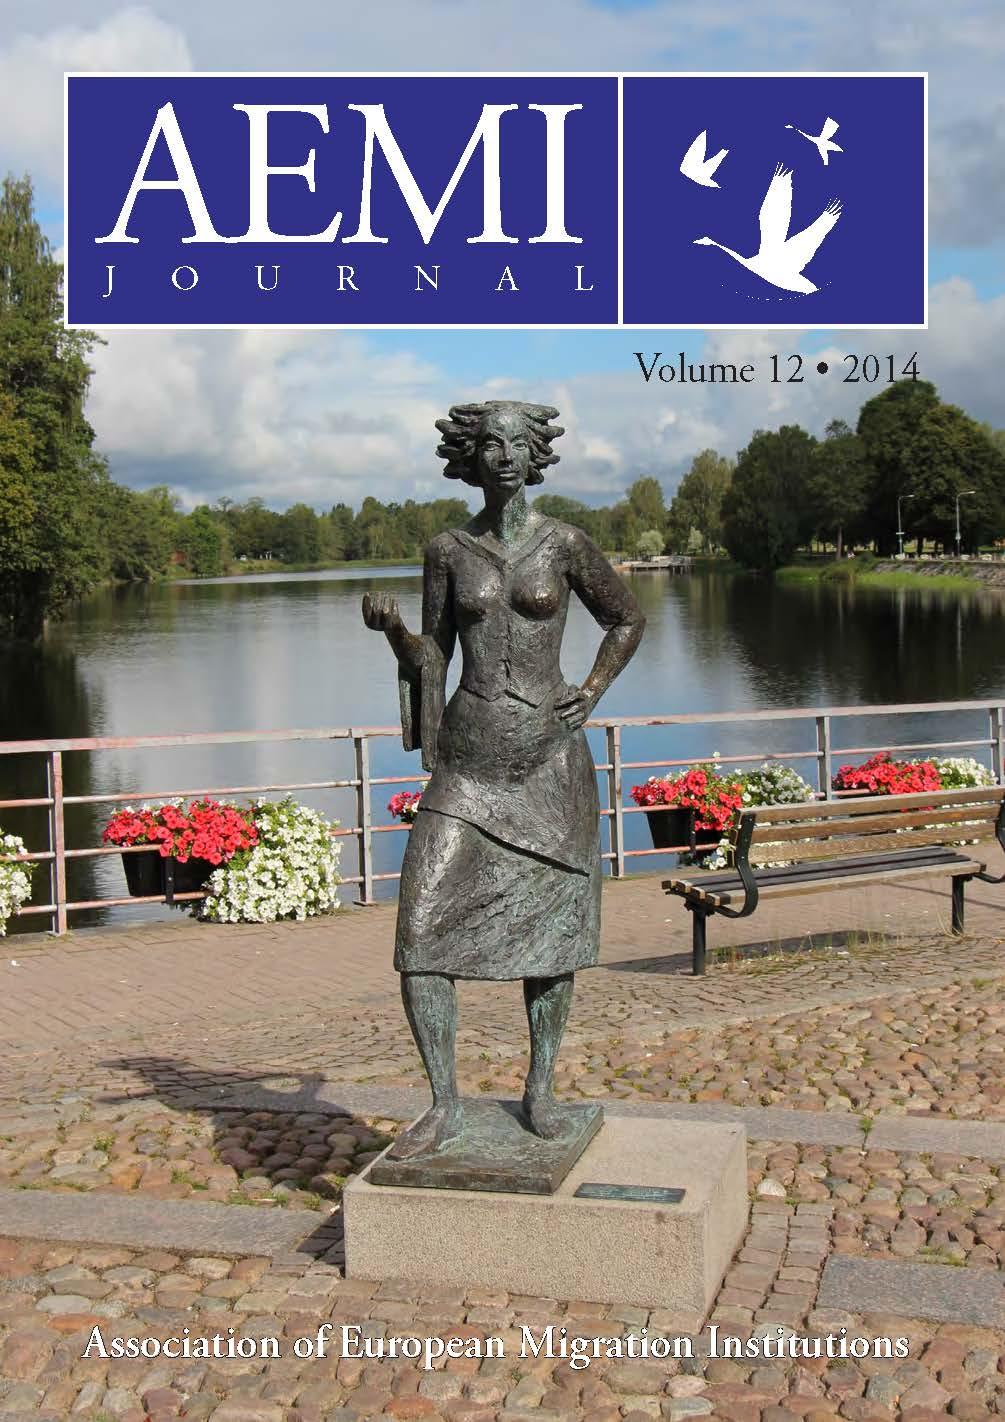 AEMI Journal – Volume 12 (2014)